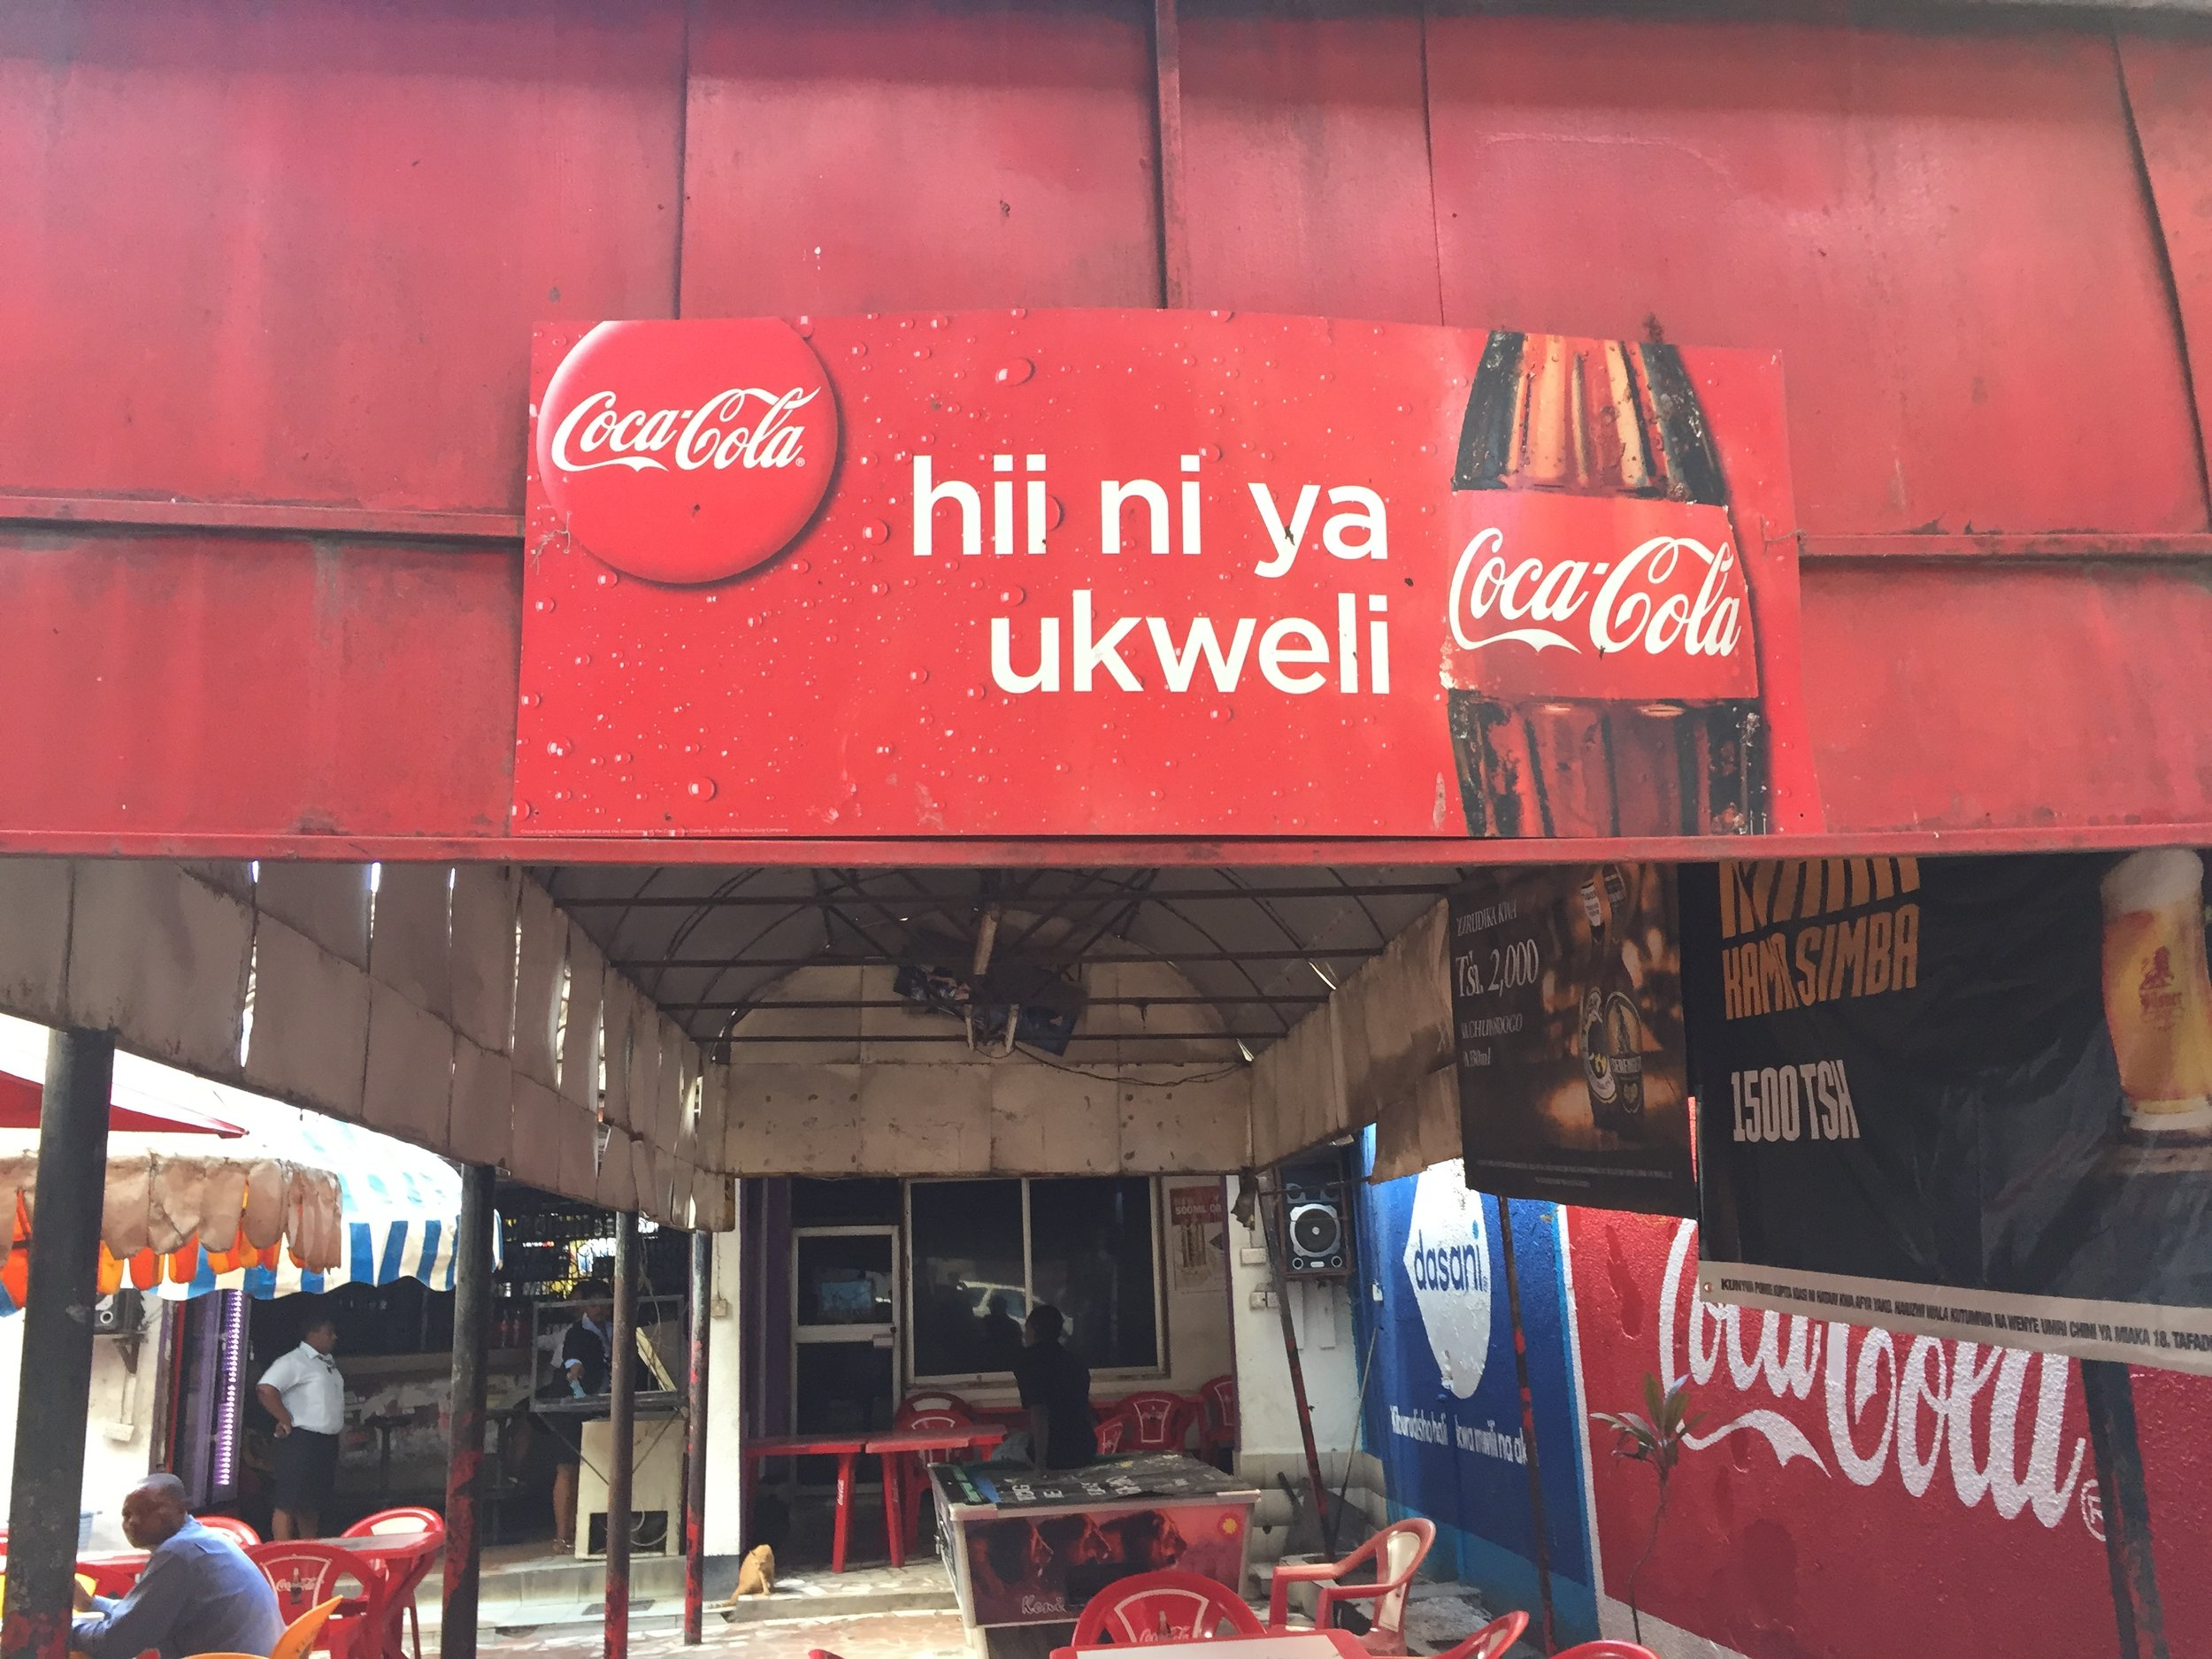 Enjoy Coke - the Swahili way.